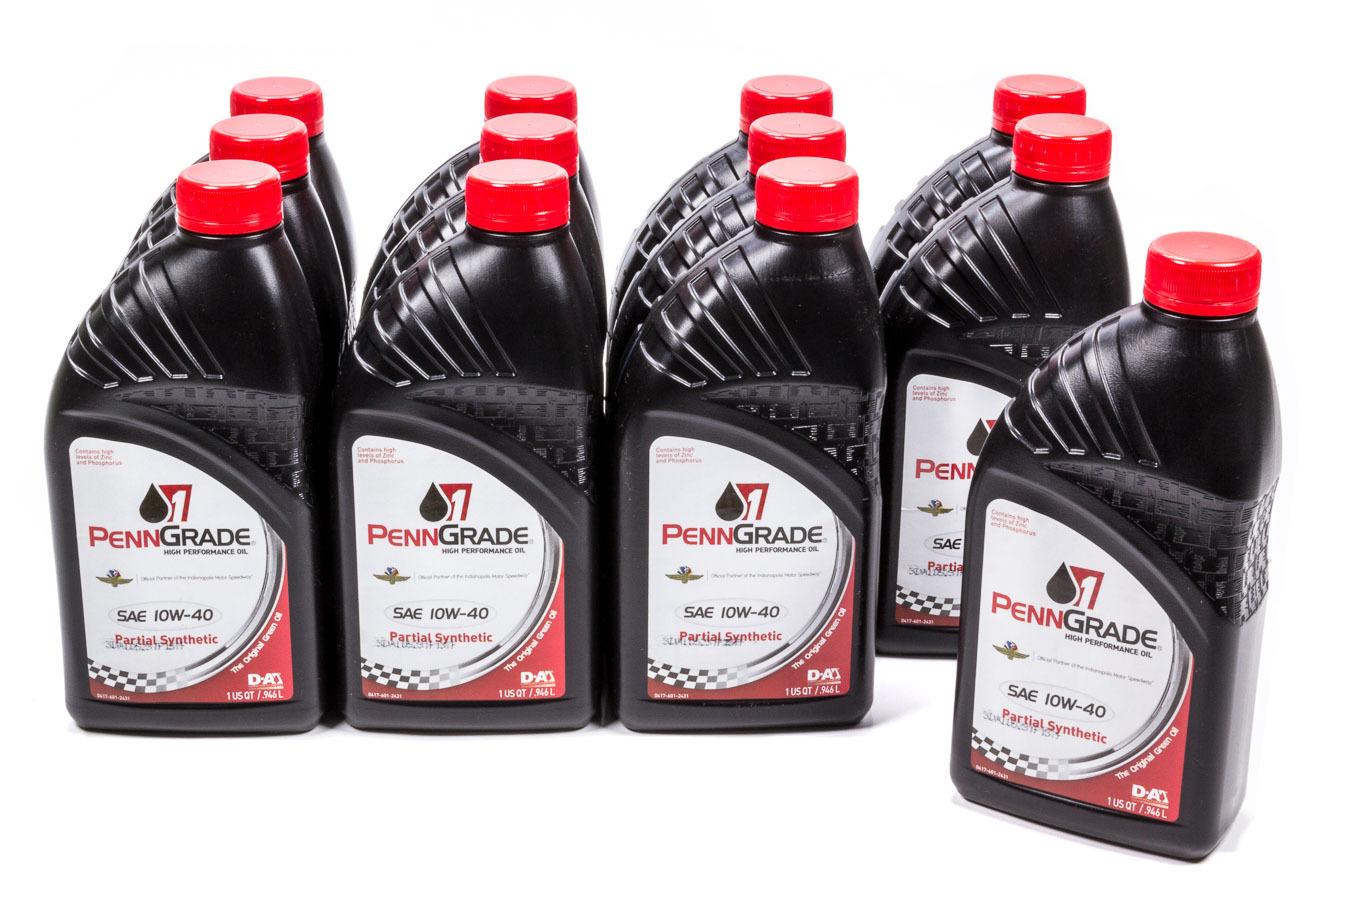 Penngrade Motor Oil 10w40 Racing Oil Cs/12Qt Partial Synthetic